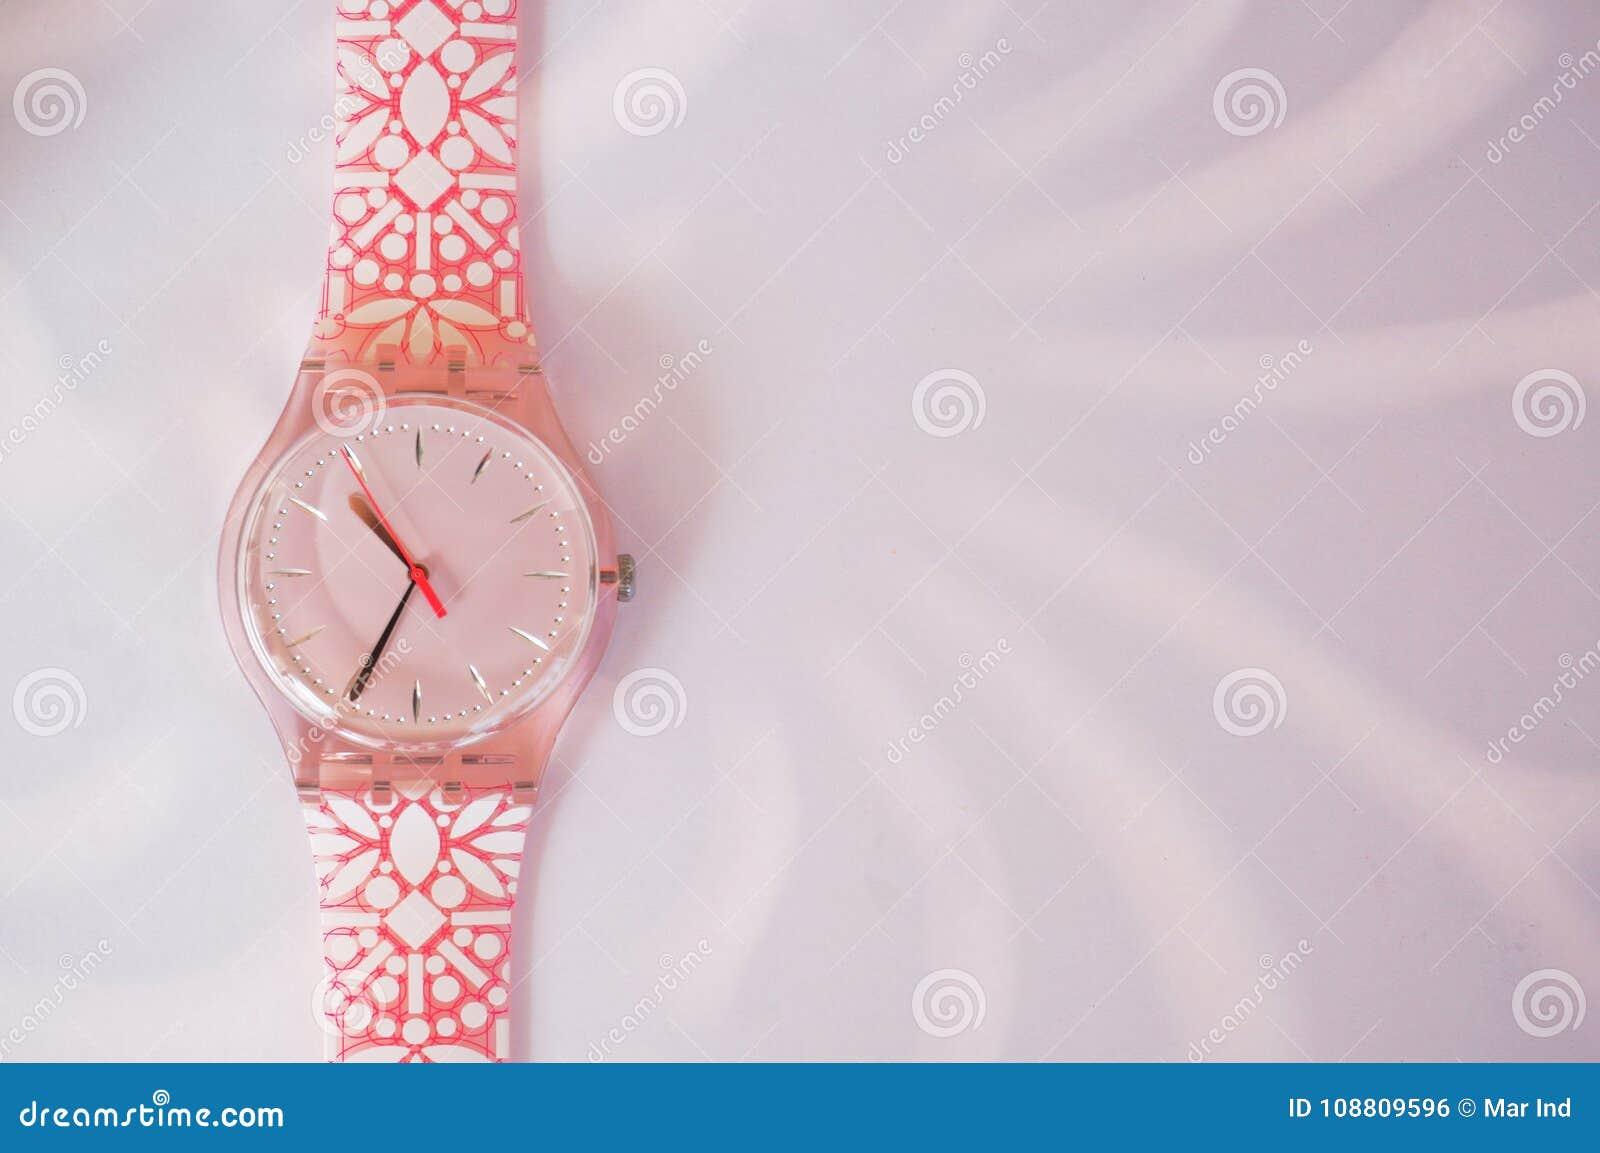 Pinky watch